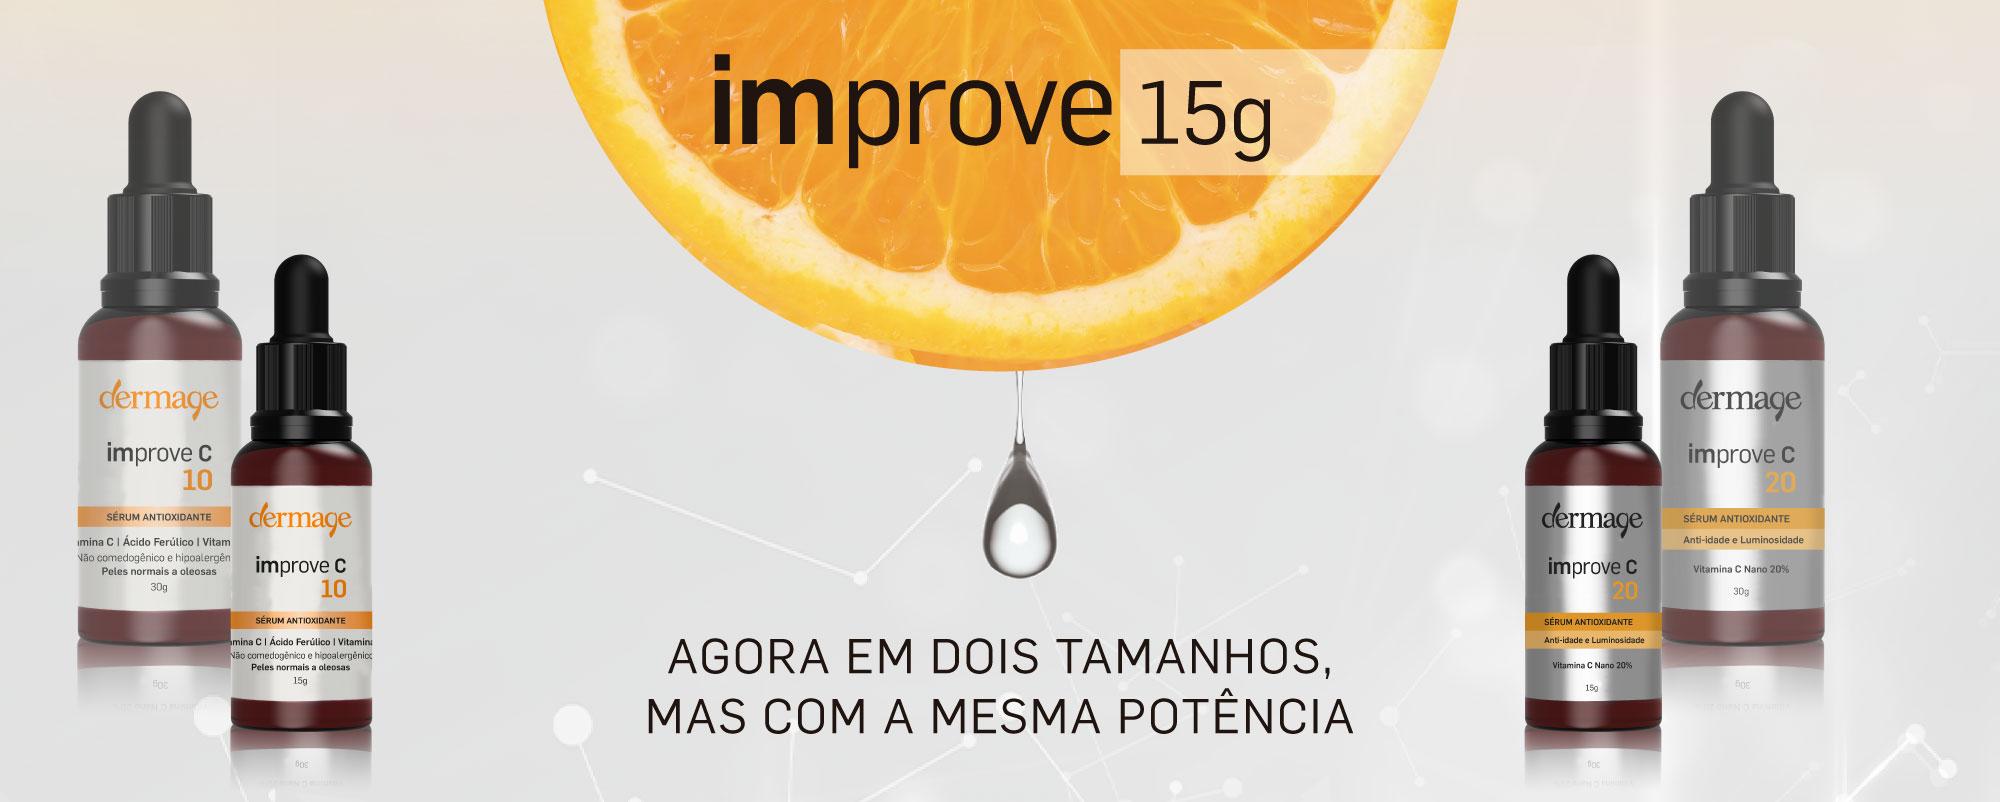 Novo Improve 15g